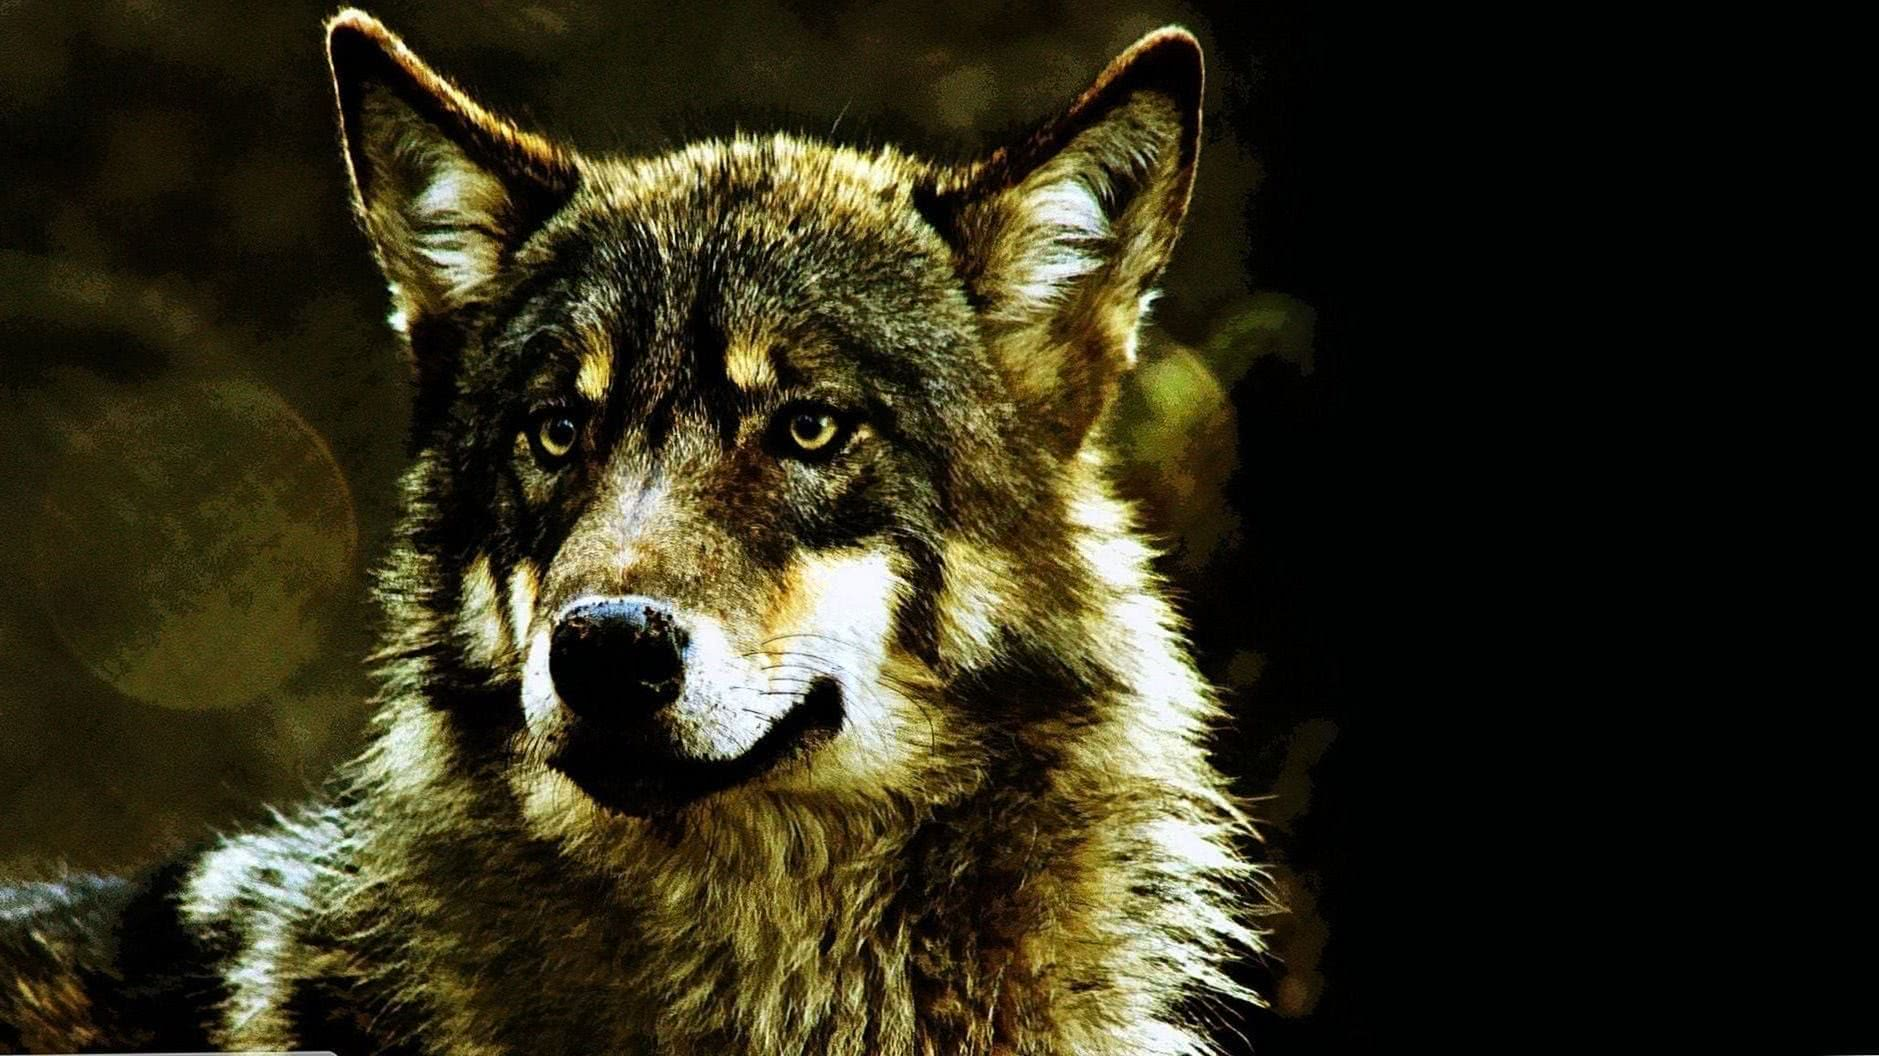 540×960 Wallpaper HD Wolf